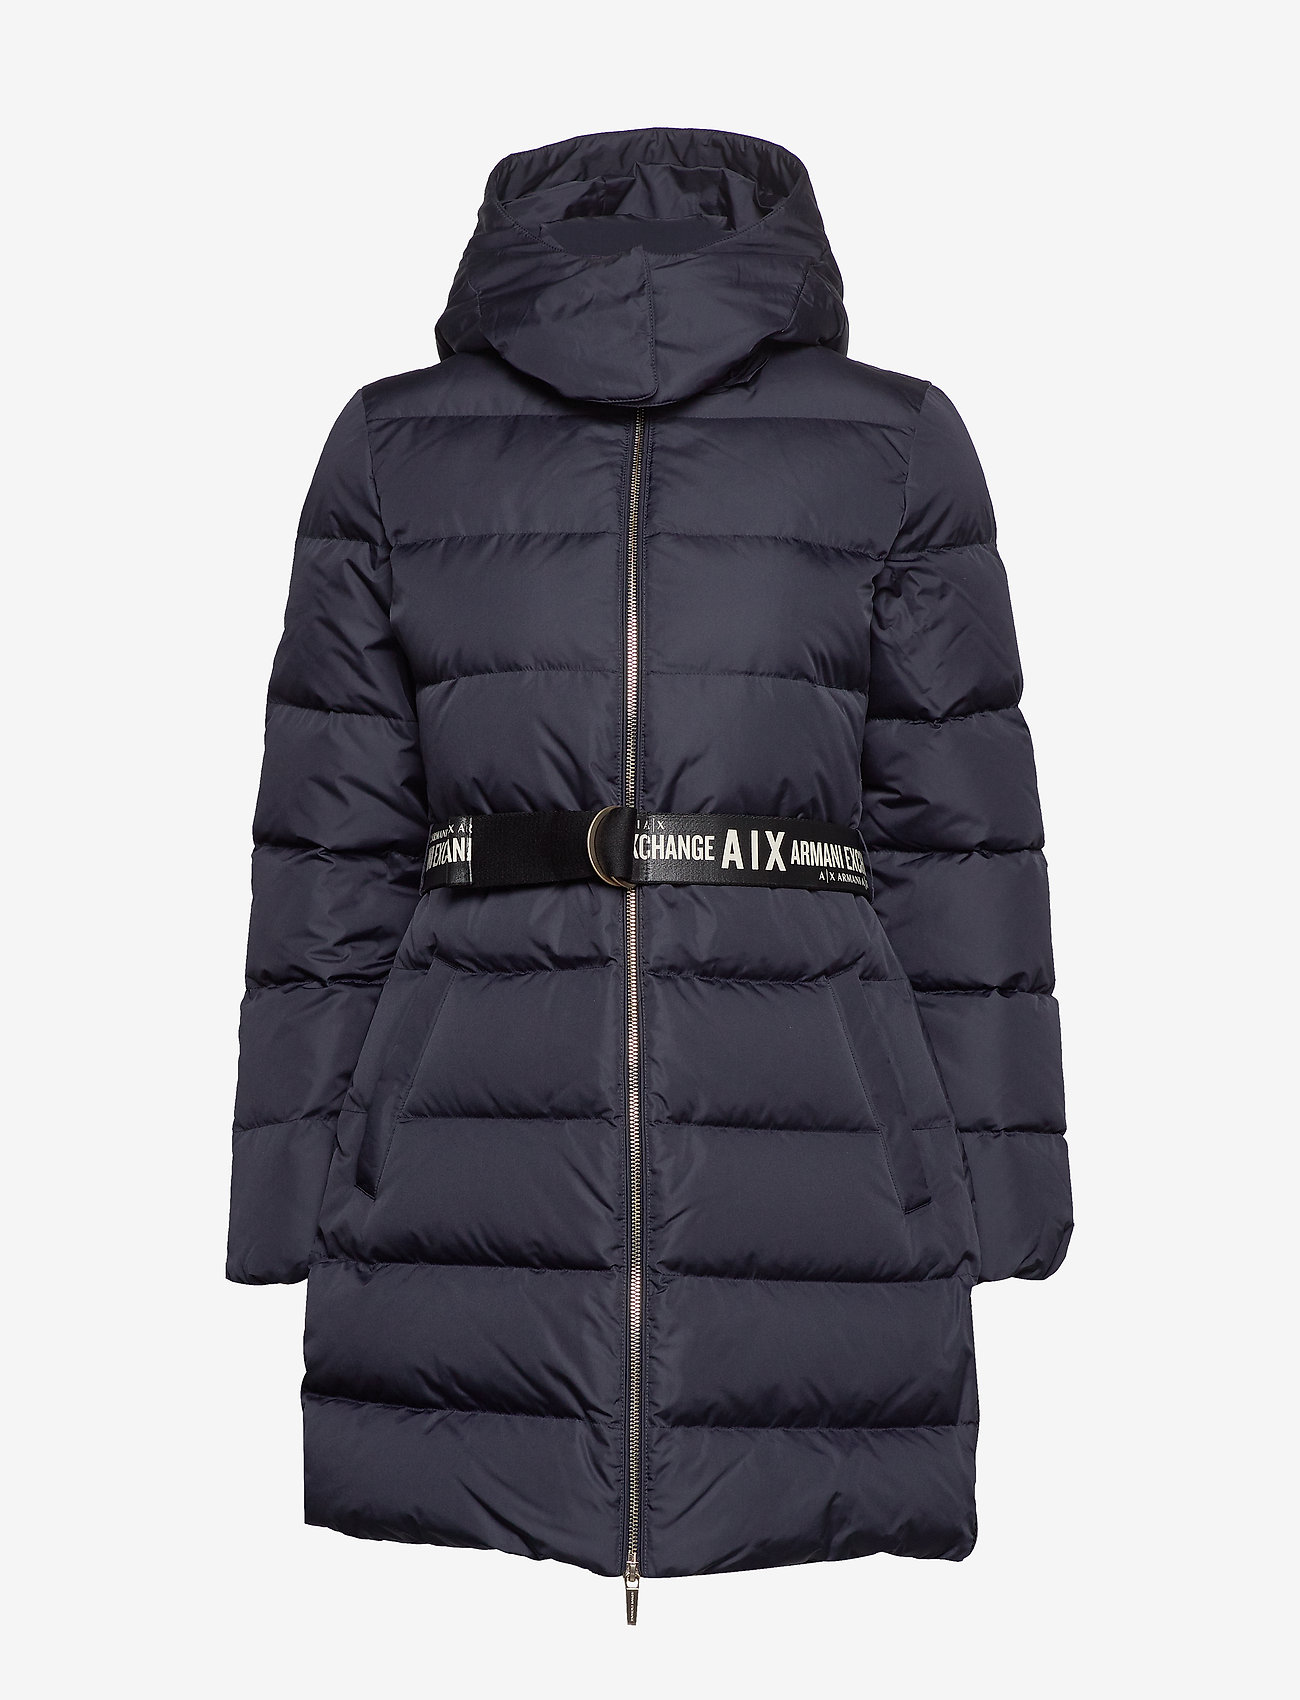 Armani Exchange Ax Woman Down Jacket - Jackor & Kappor Blueberry Jelly